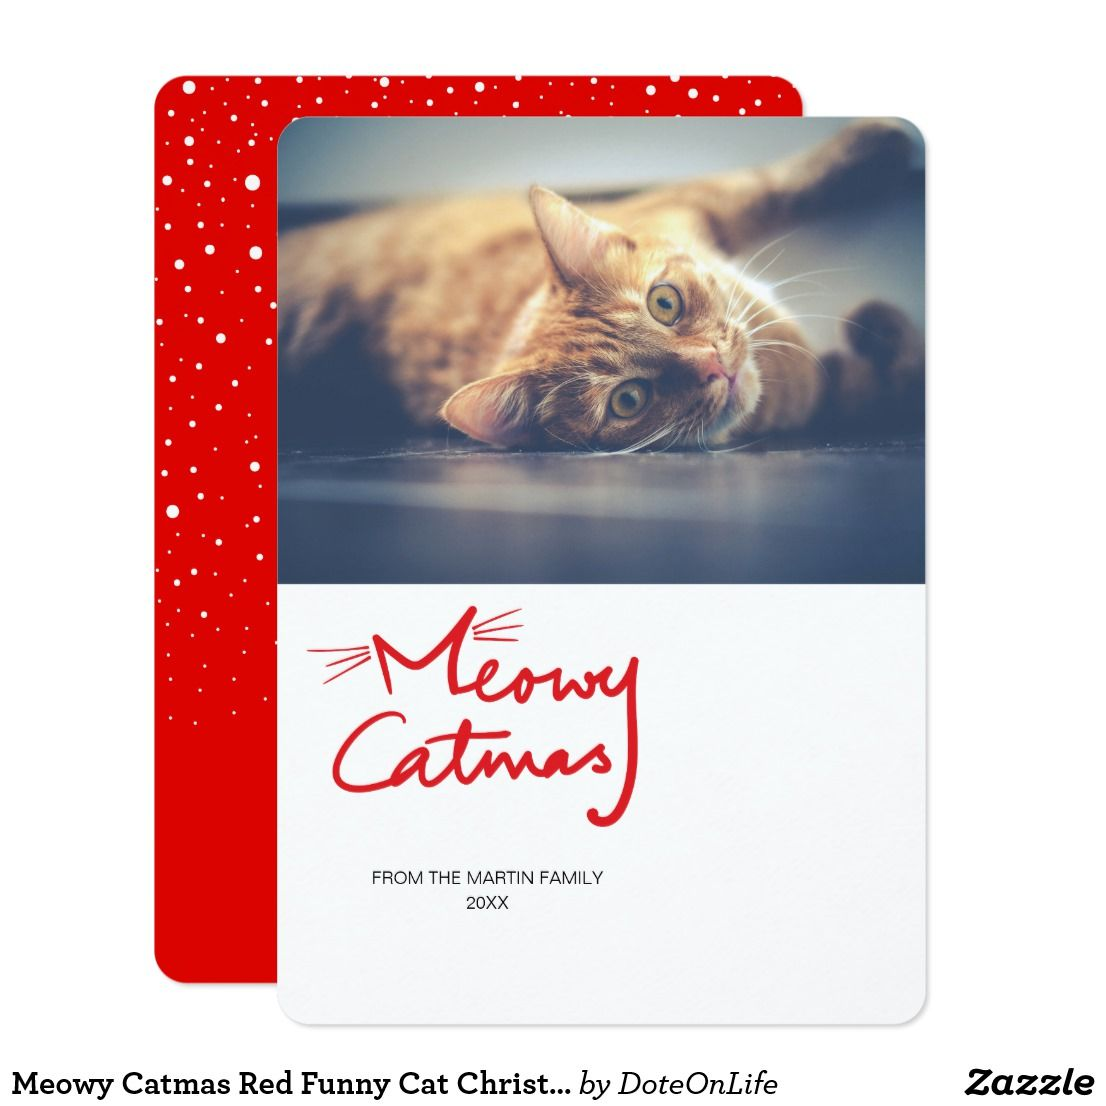 meowy catmas funny cat christmas photo card this custom